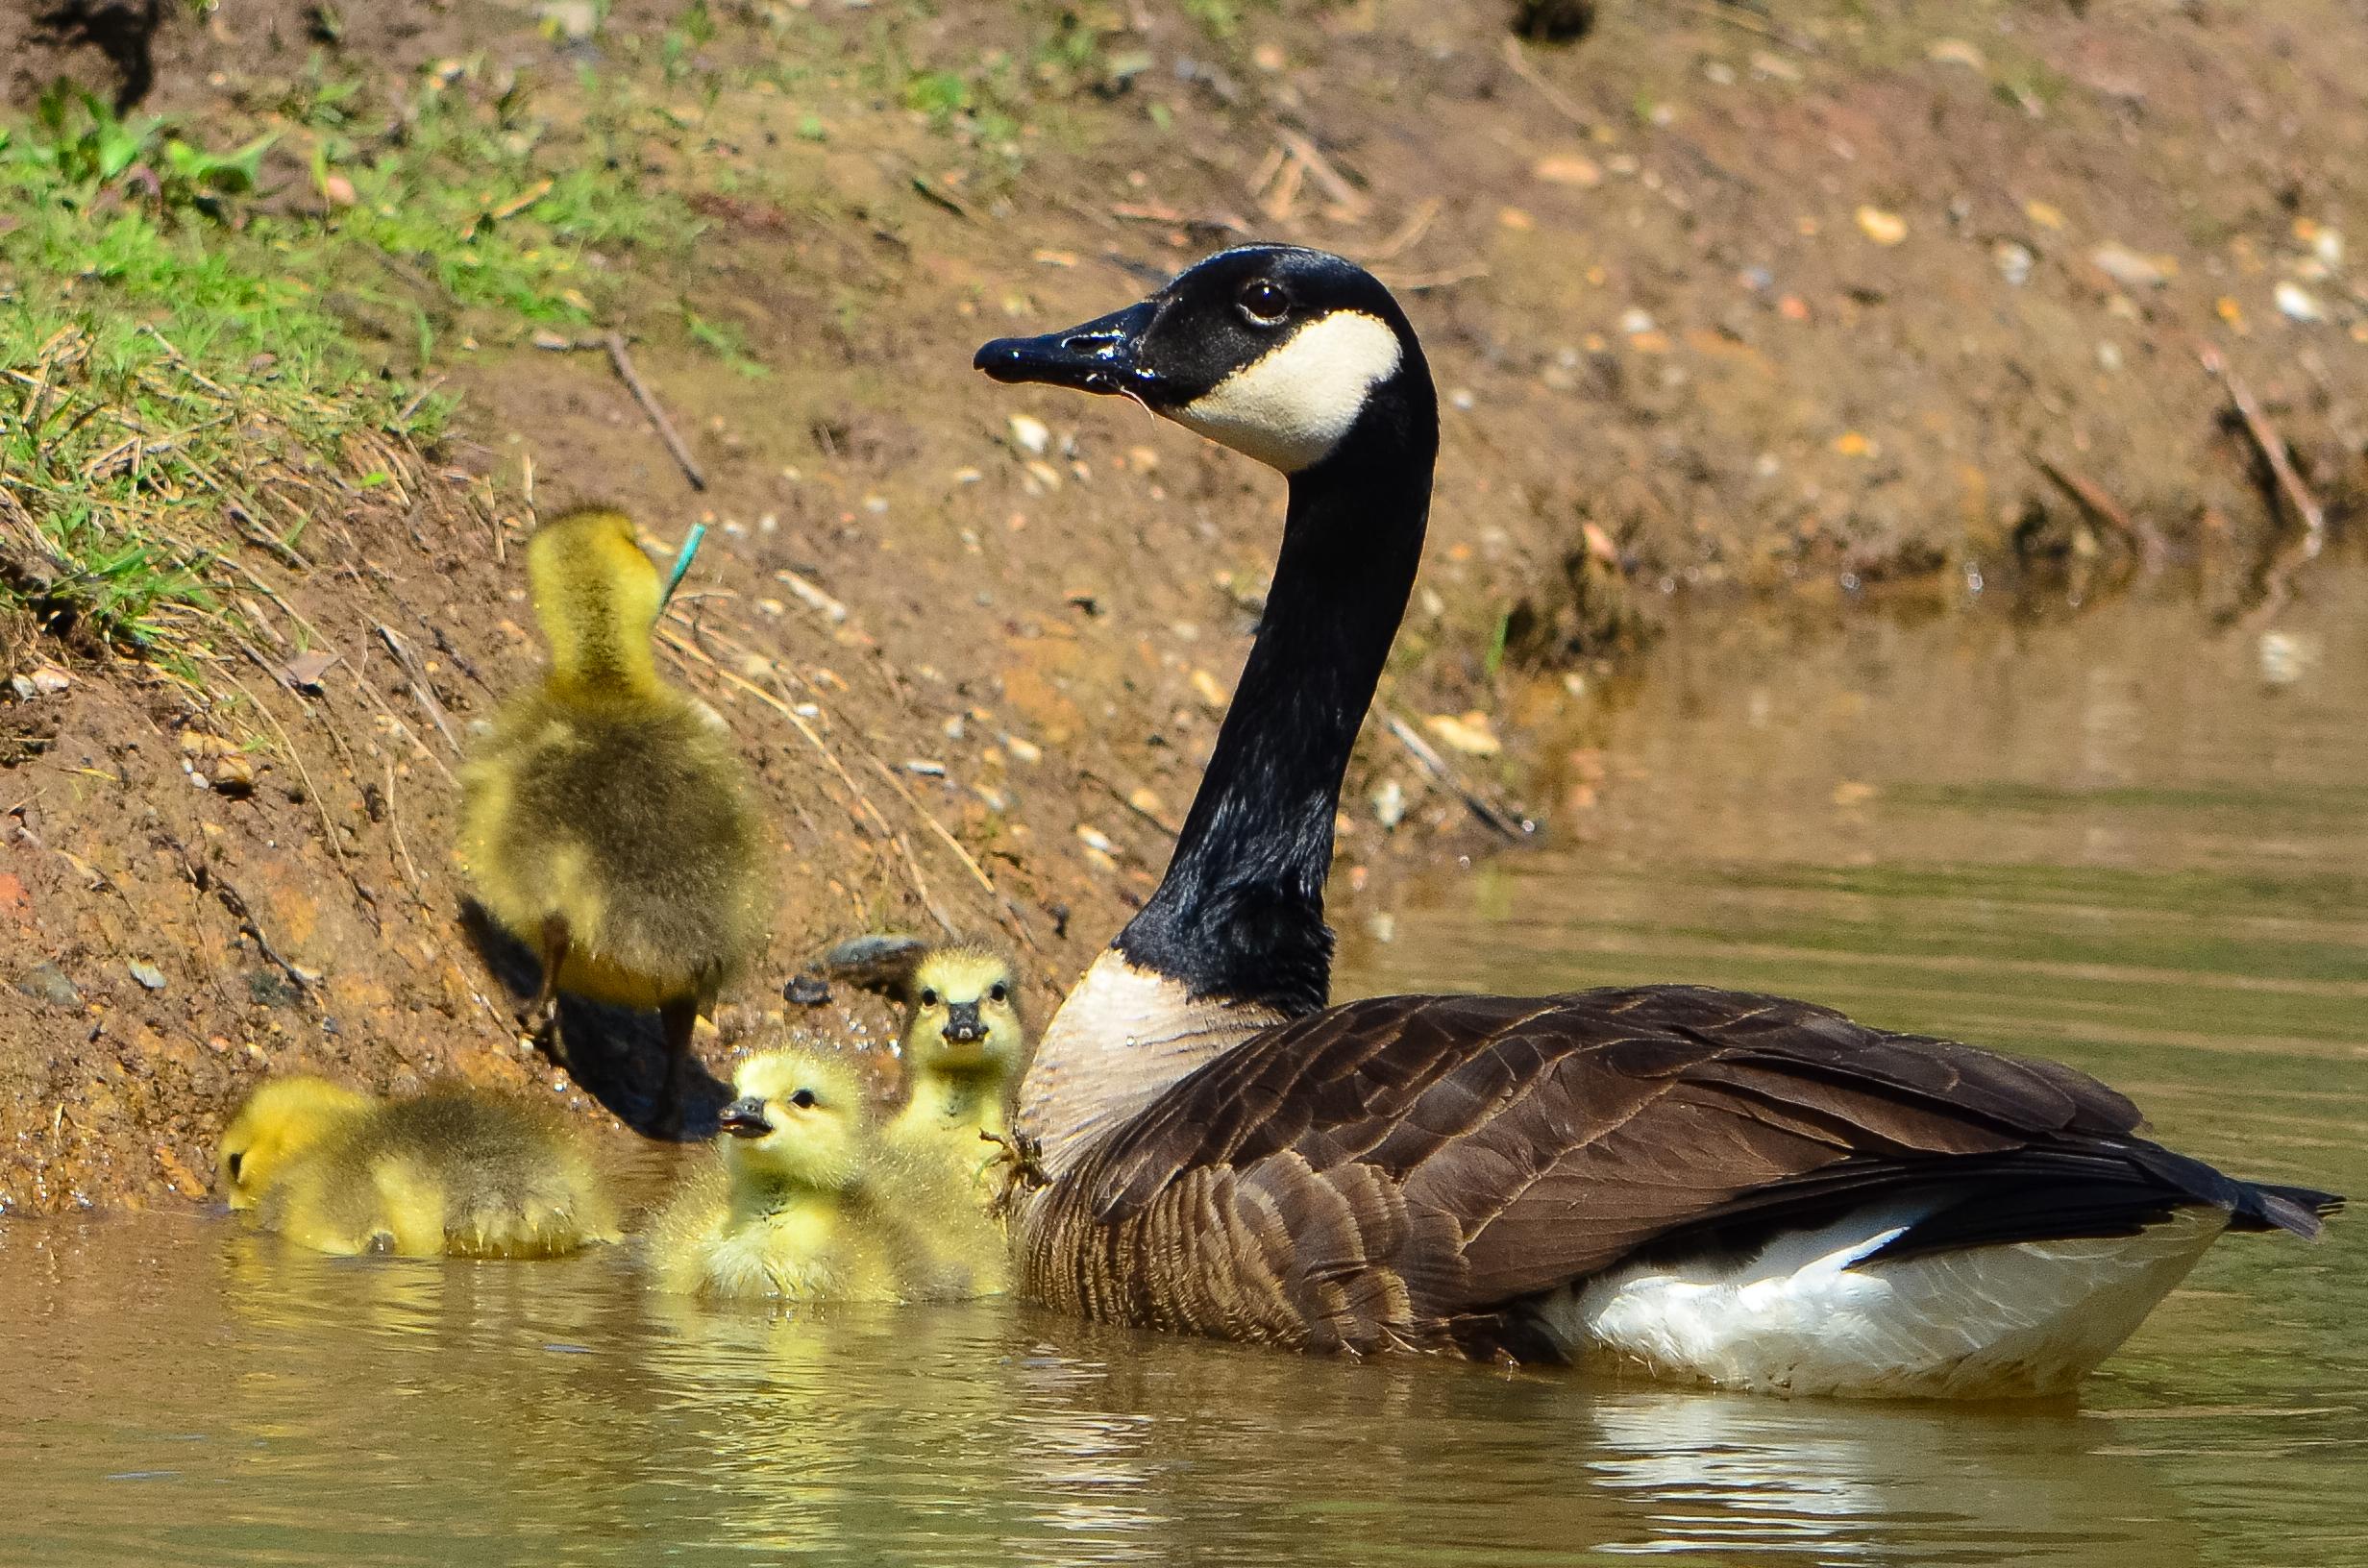 File:Kenilworth Aquatic Gardens (8666119235).jpg - Wikimedia Commons